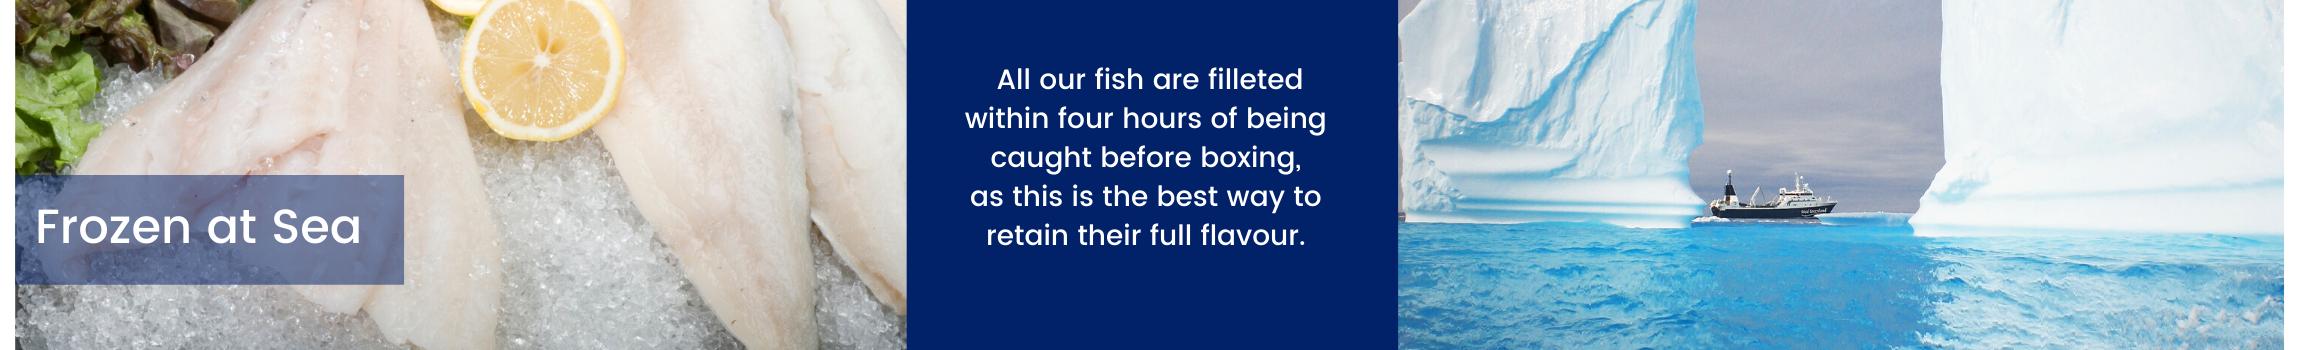 F.A.S. FISH